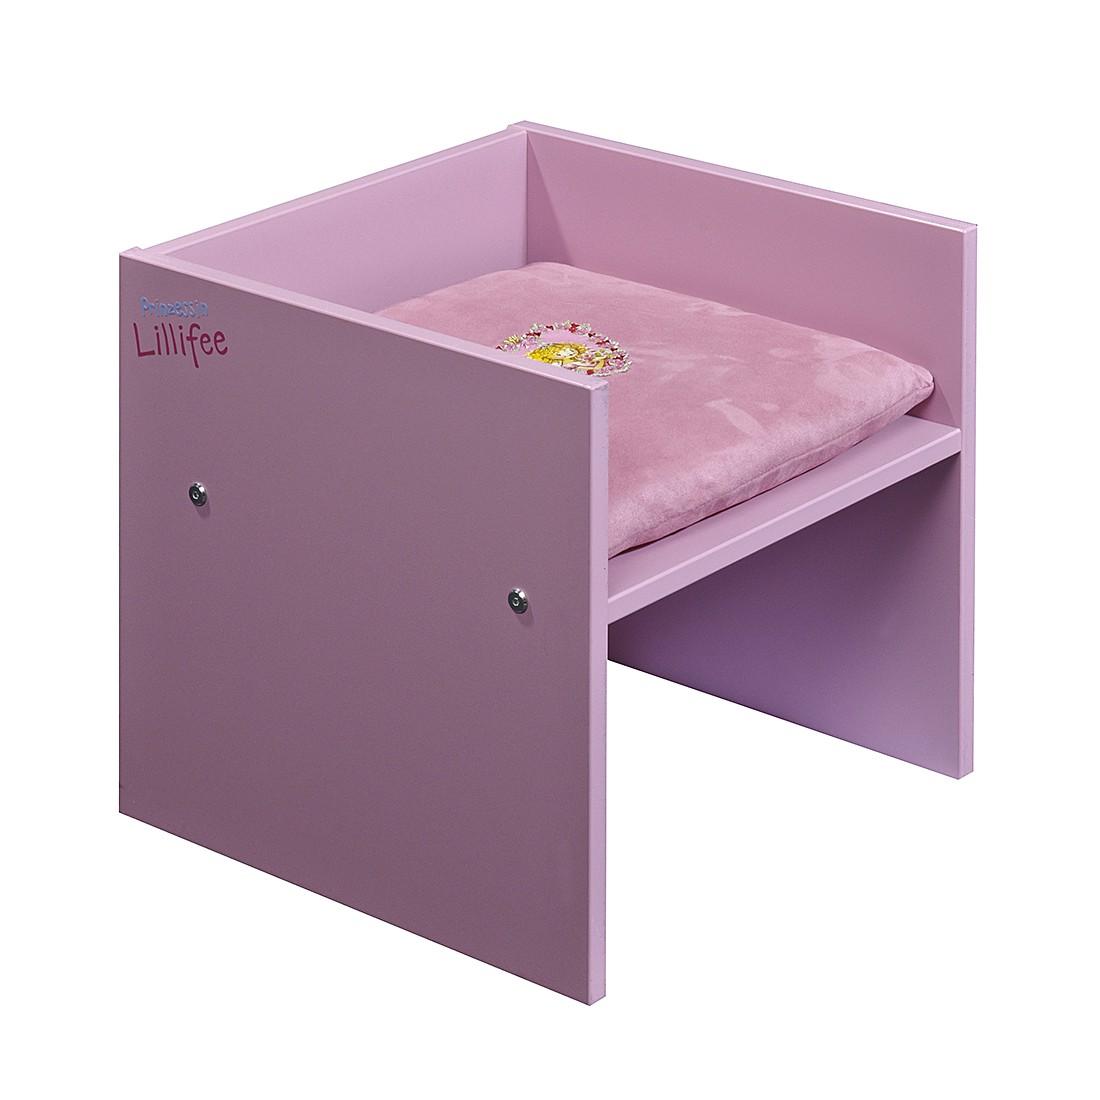 m bel prinzessin preis vergleich 2016. Black Bedroom Furniture Sets. Home Design Ideas